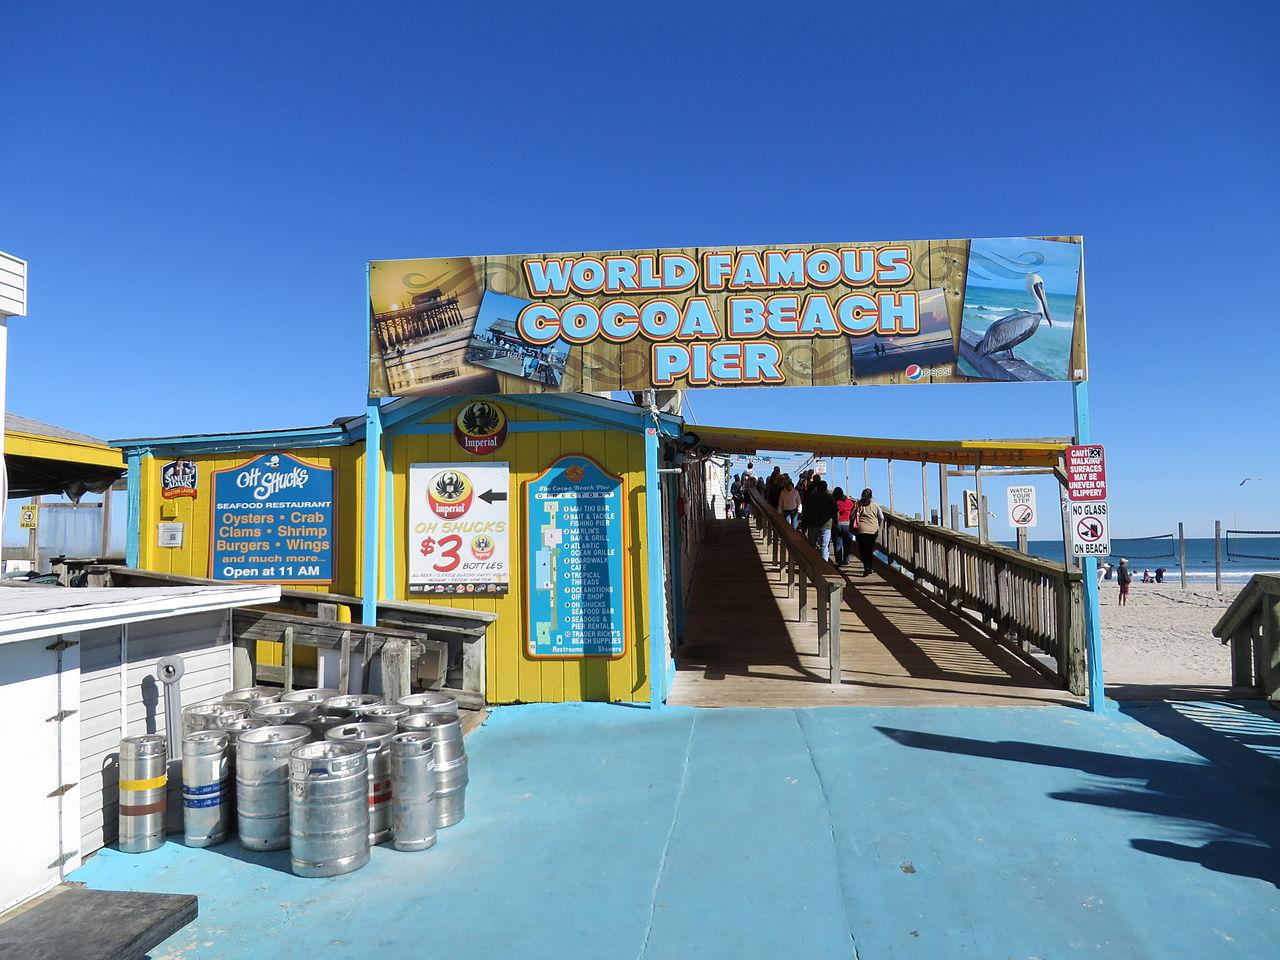 Dating Cocoa Beach Women - Meet Single Girls in Cocoa Beach